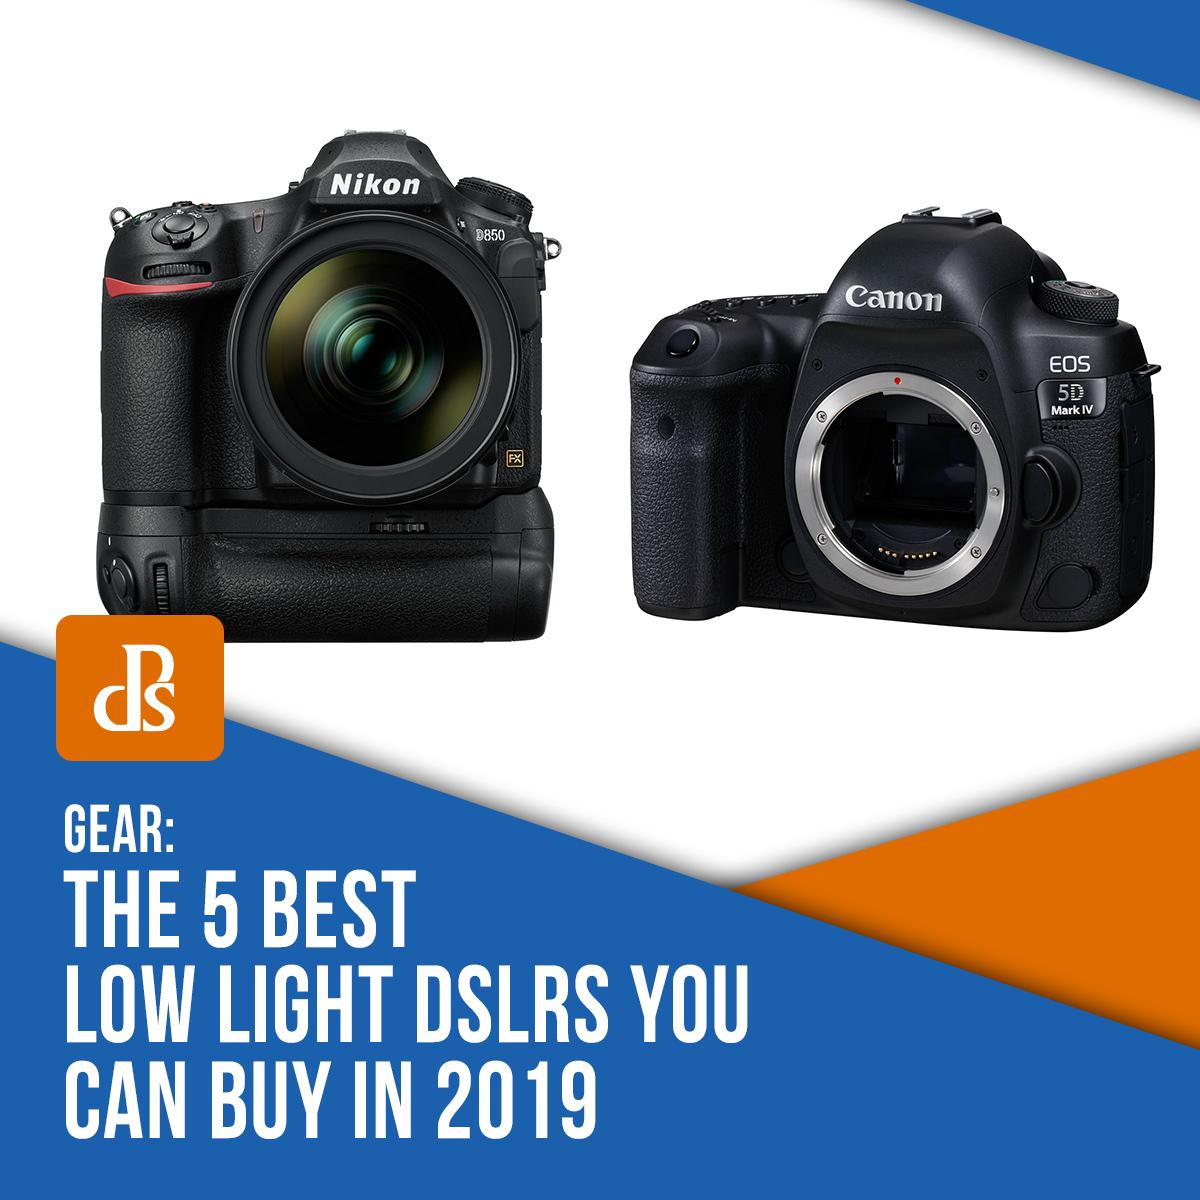 best-low-light-dslrs-you-can-buy-in-2019